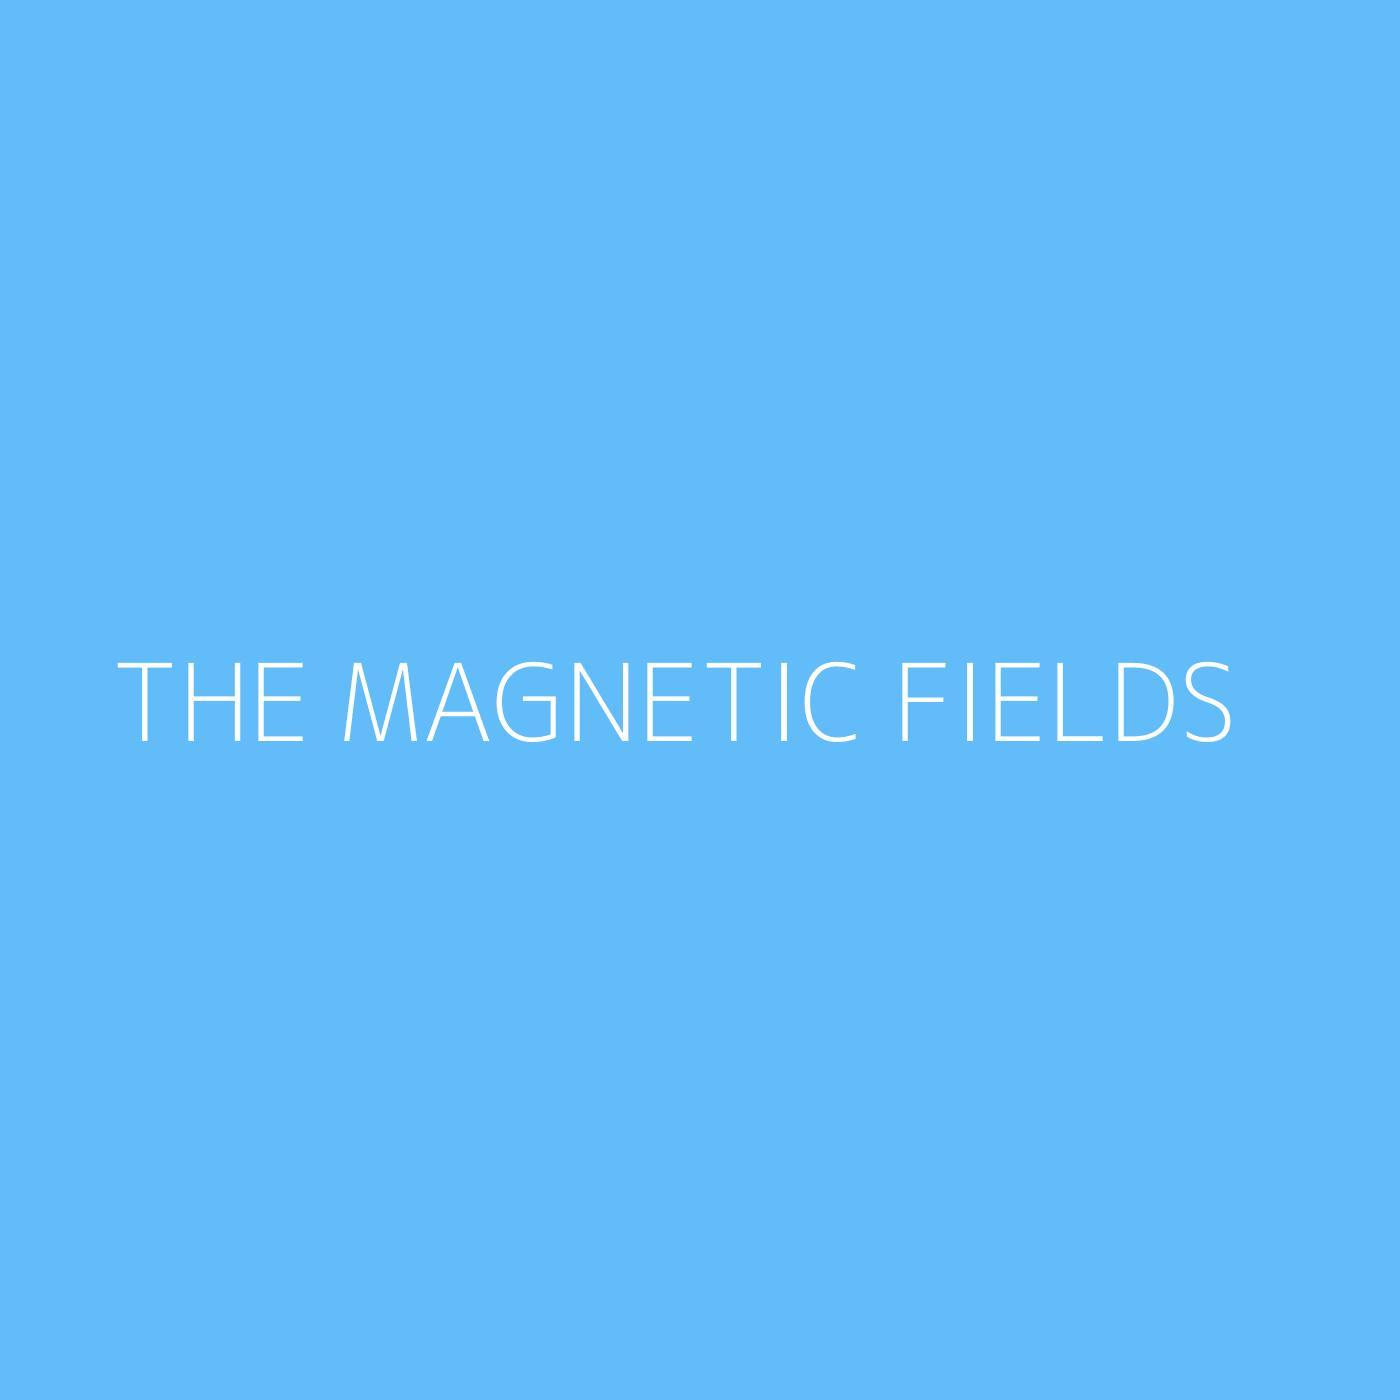 The Magnetic Fields Playlist Artwork